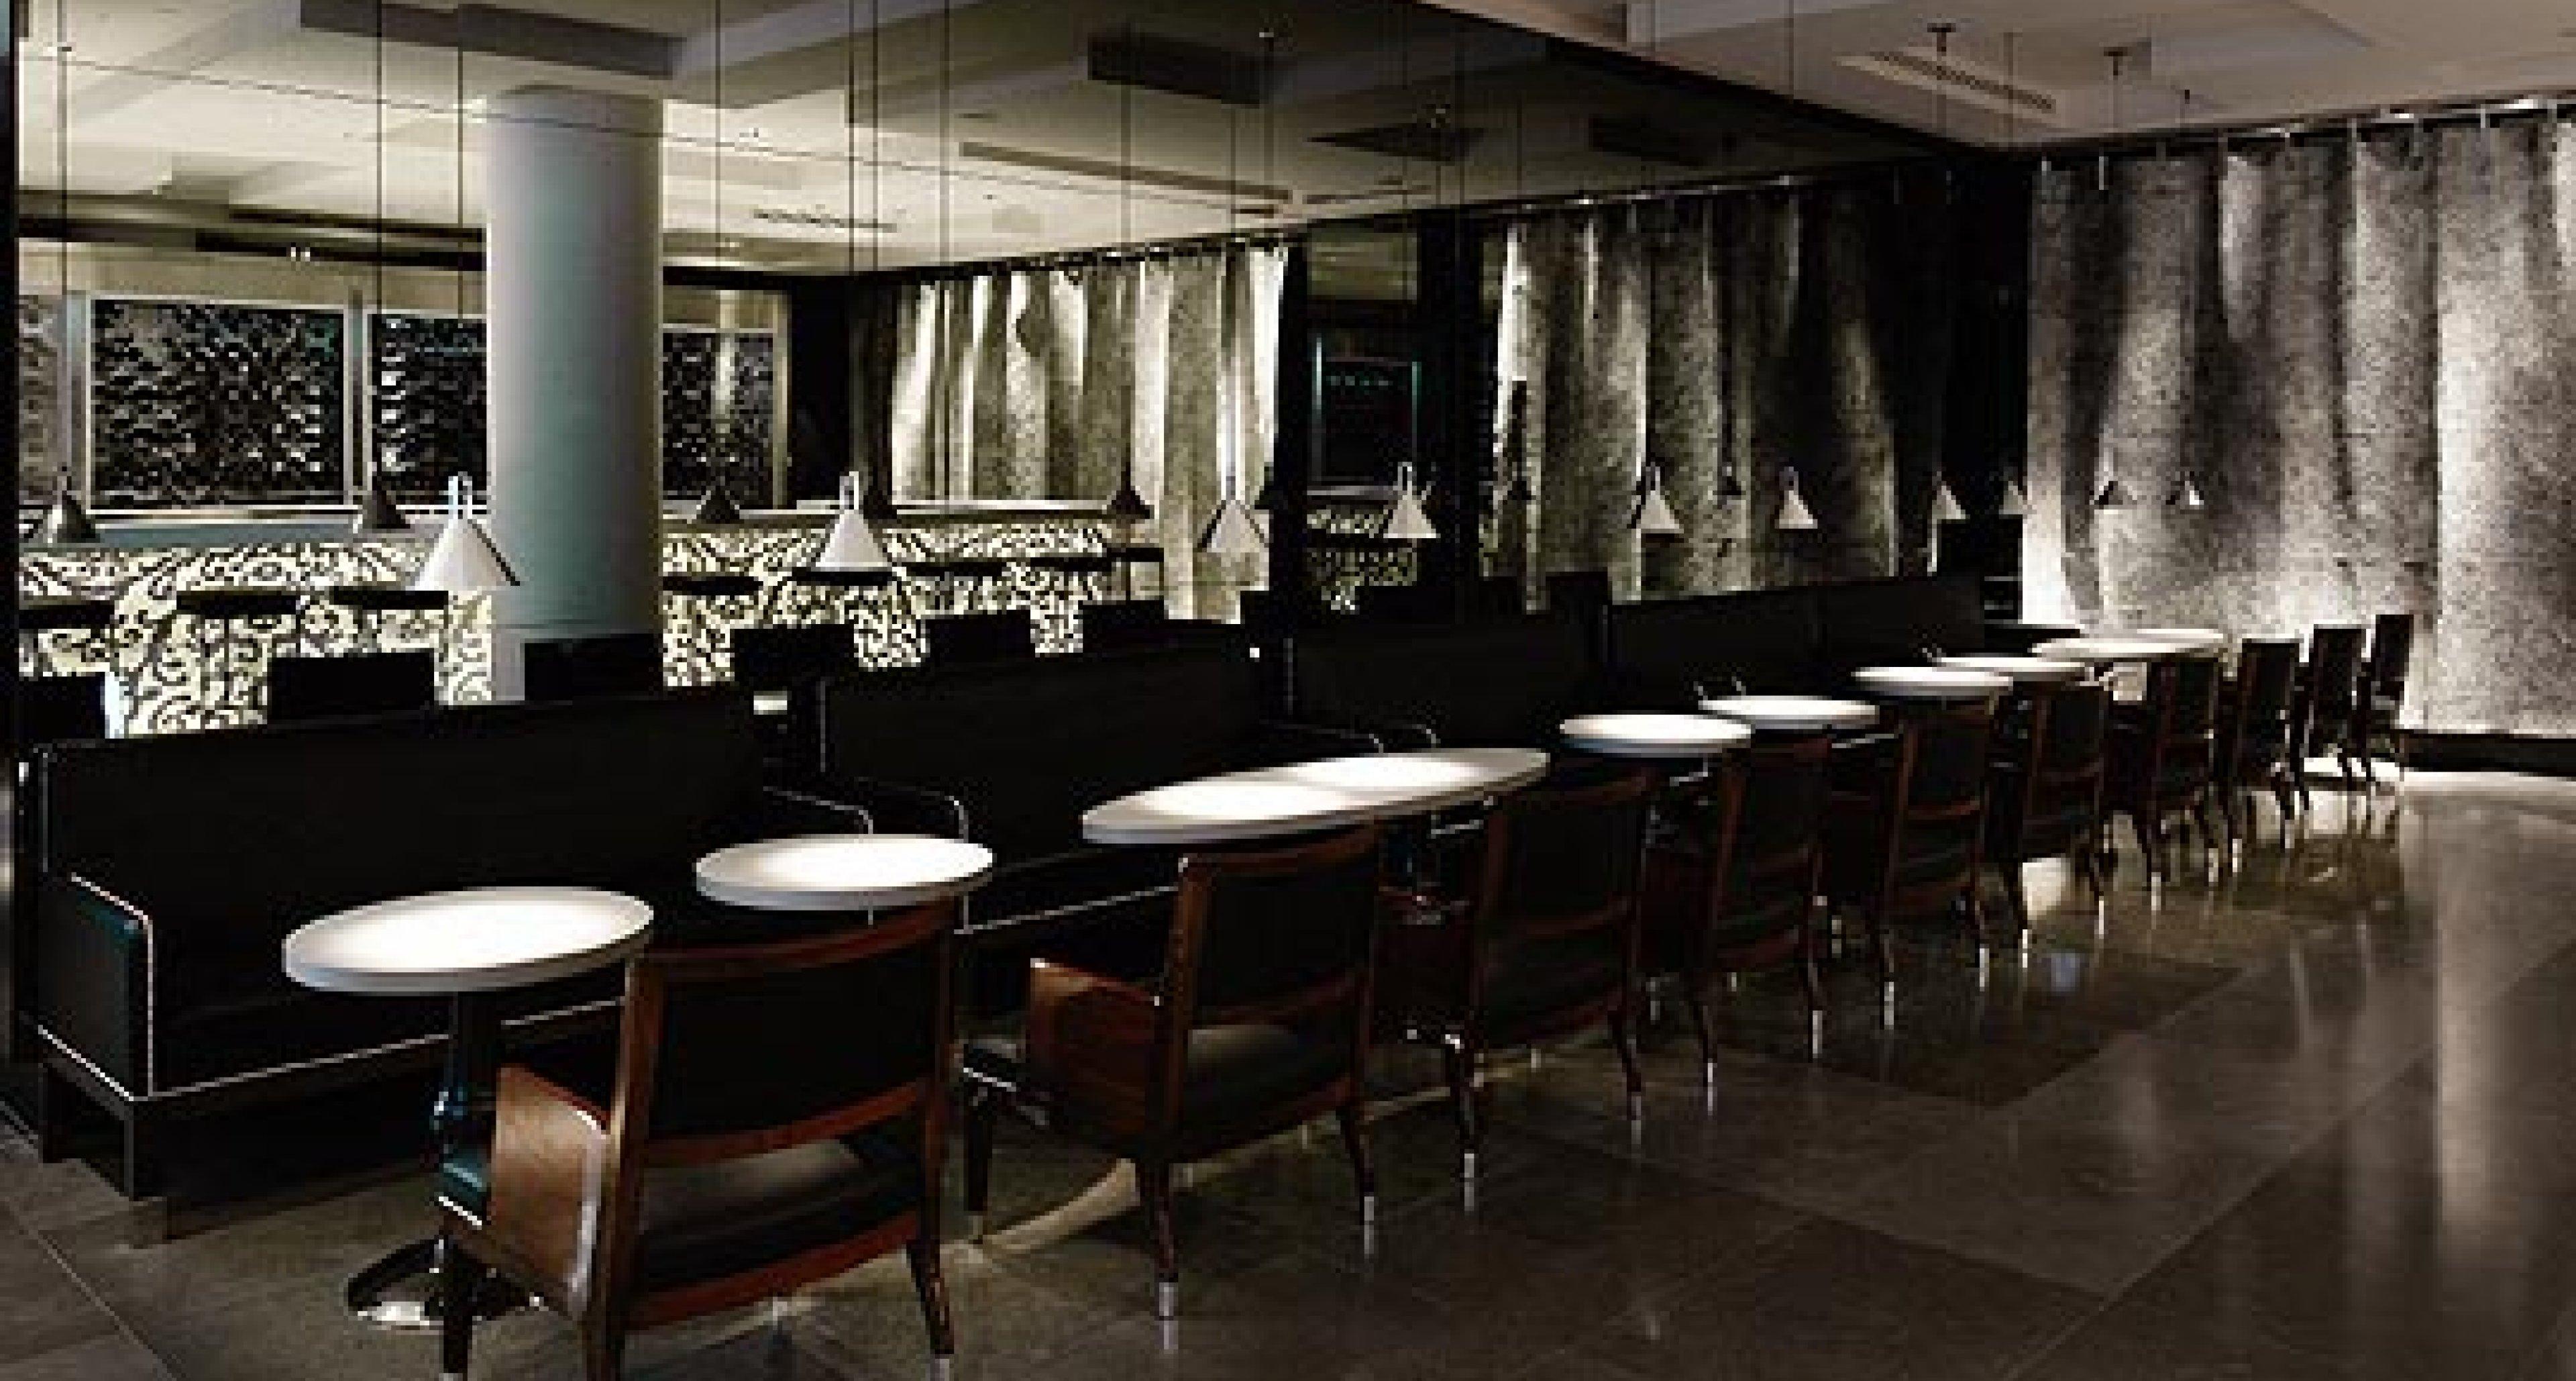 Hotel Puerta América: Das 19-Designstars Hotel